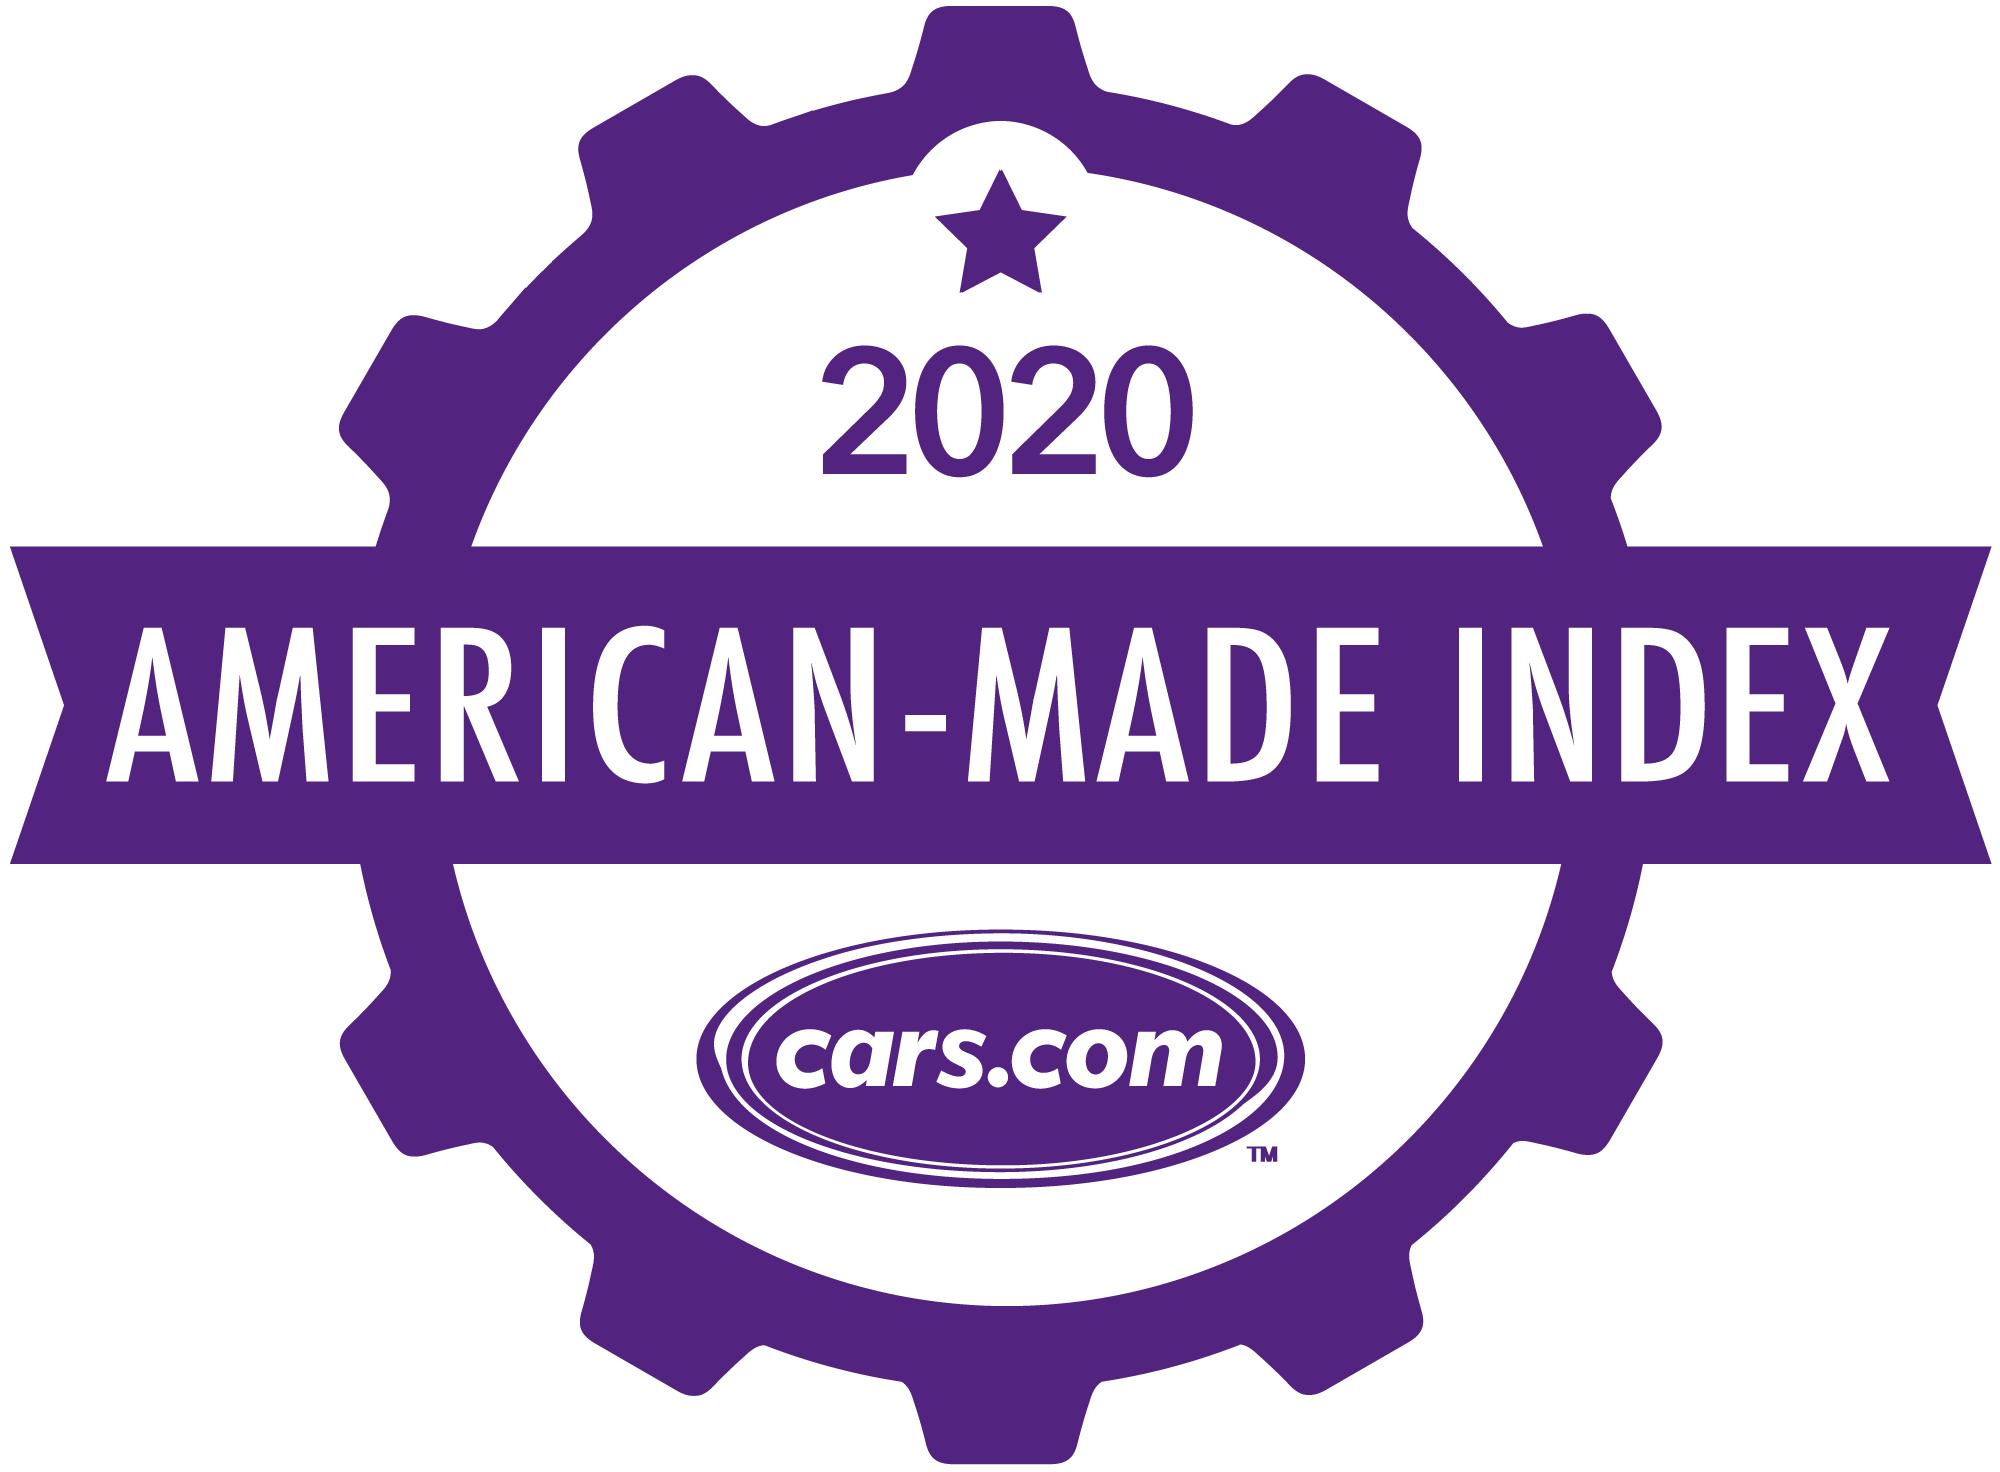 Cars.com 2020 American-Made Index